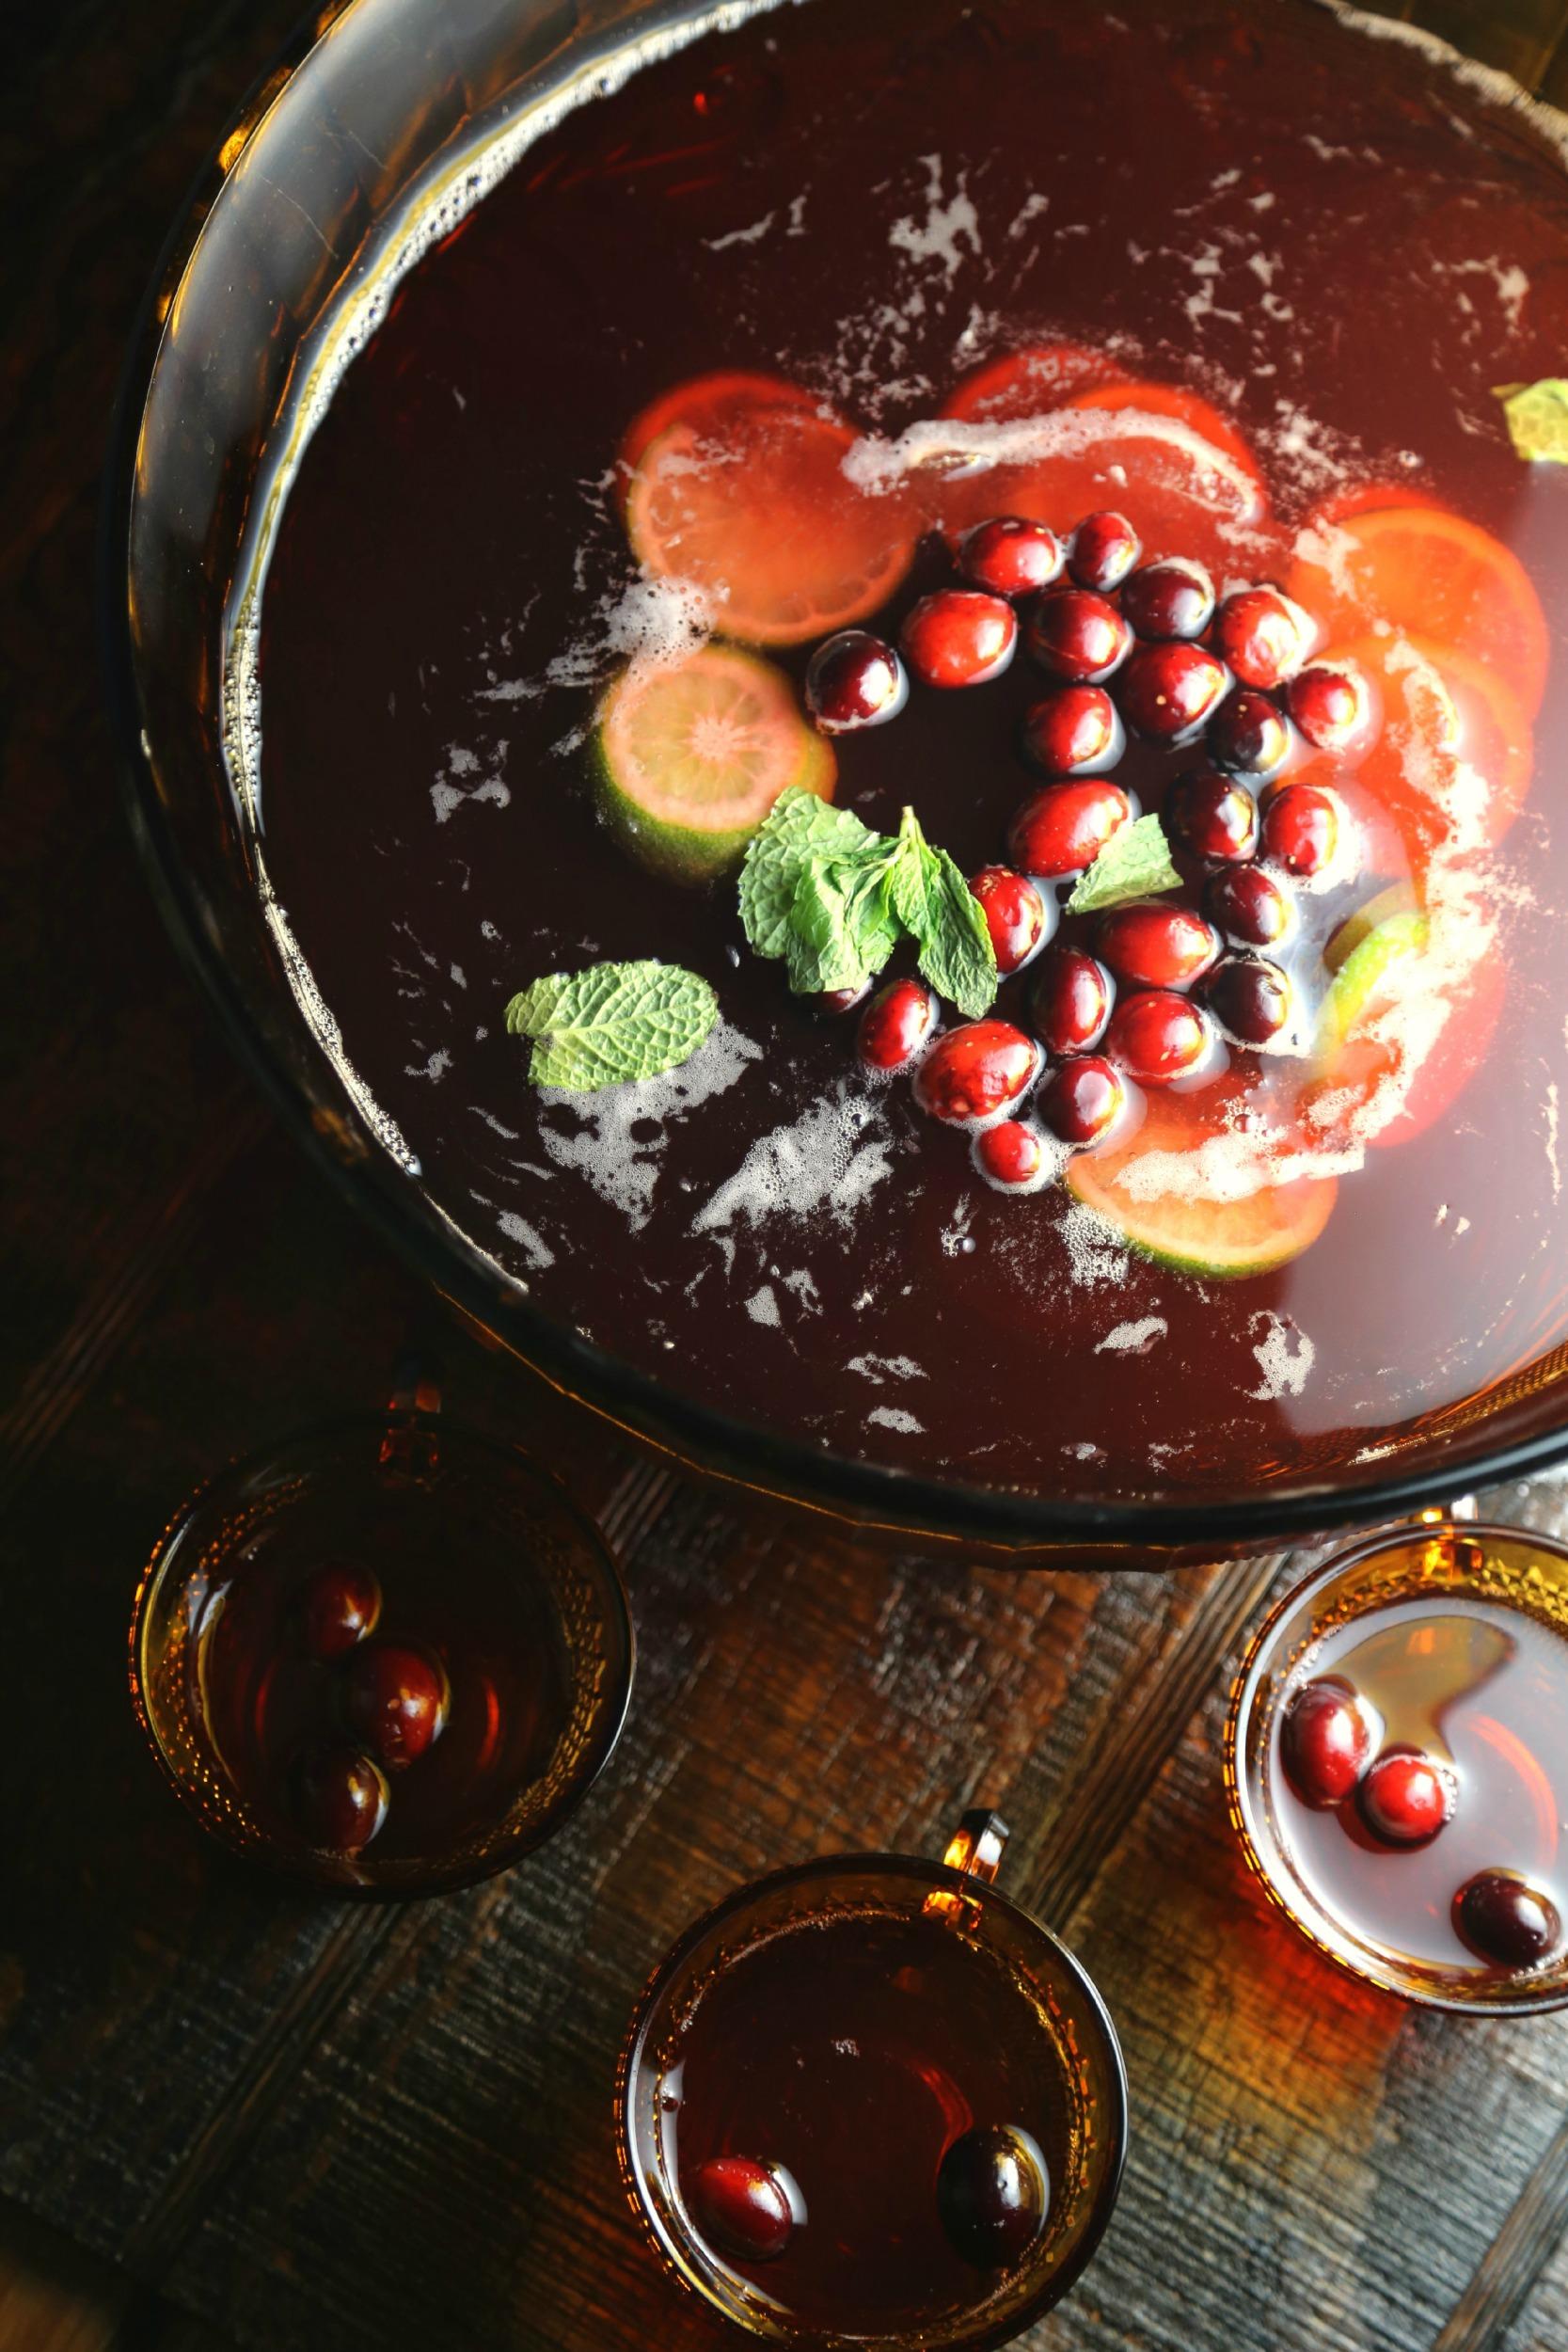 cranberry-holiday-punch-pisco-vianneyrodriguez-sweetlifebake